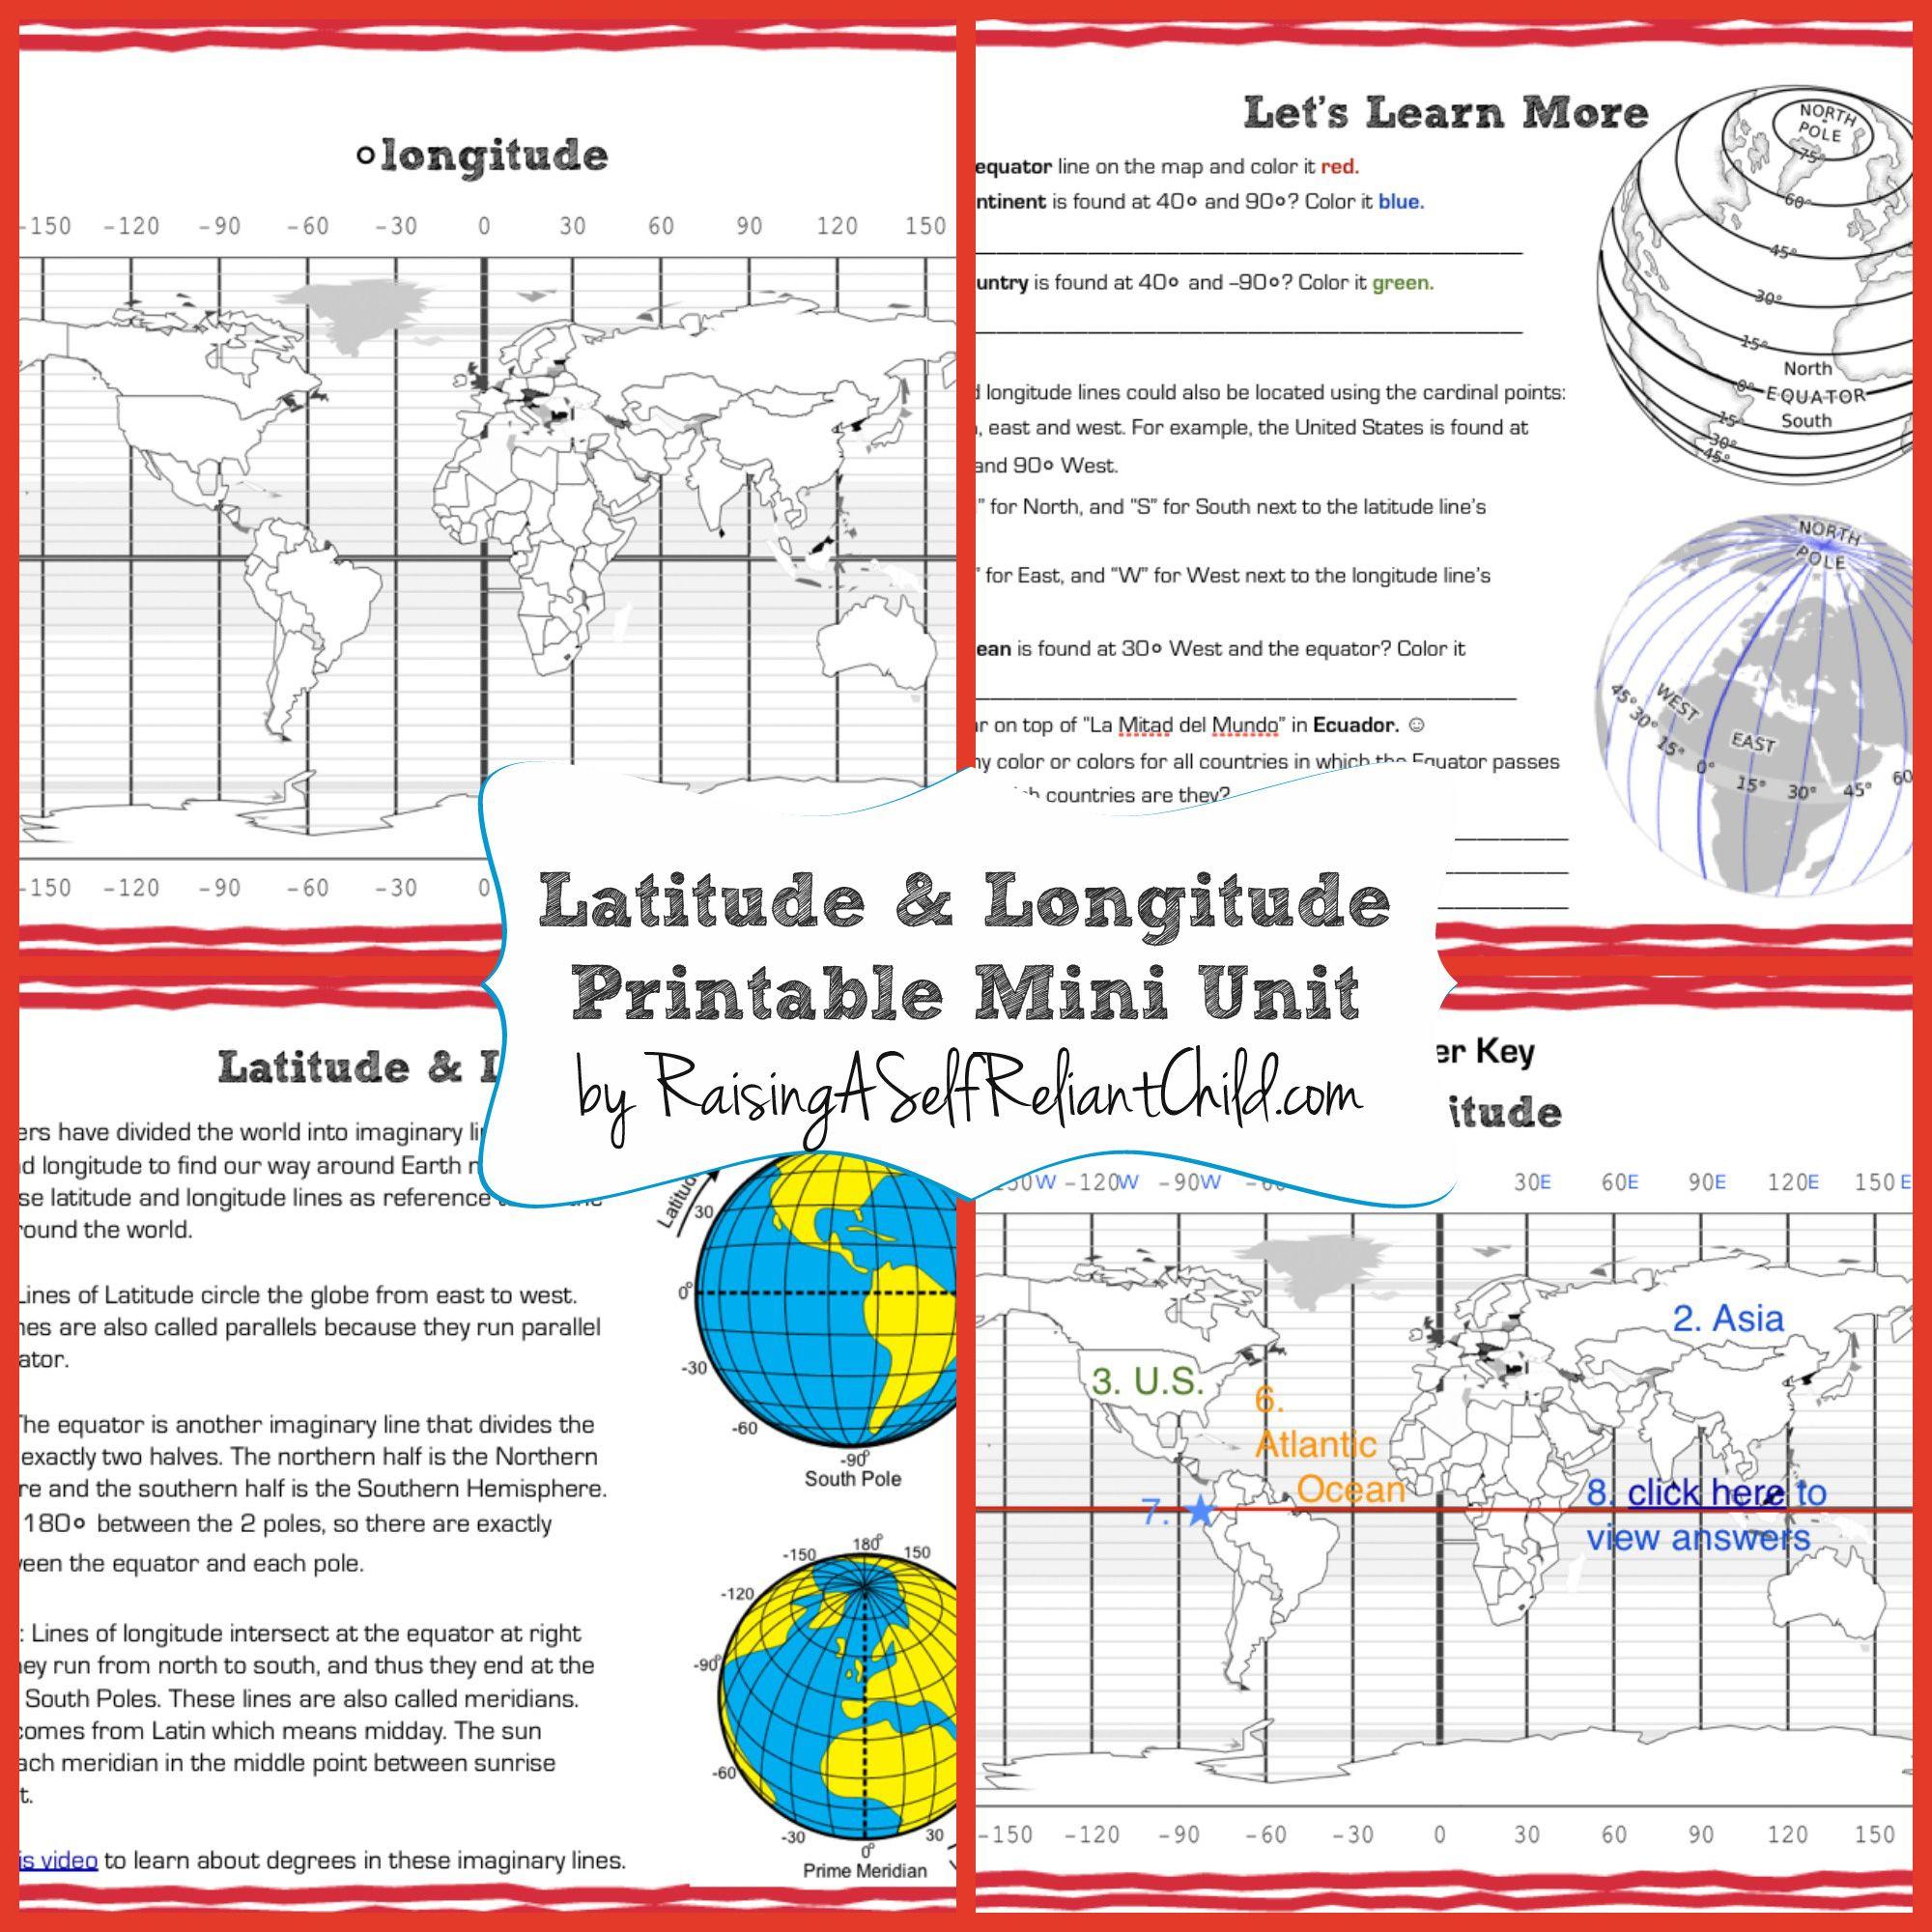 Free Printable Mini Unit Latitude And Longitude For Kids | The | Latitude Longitude Printable Worksheets